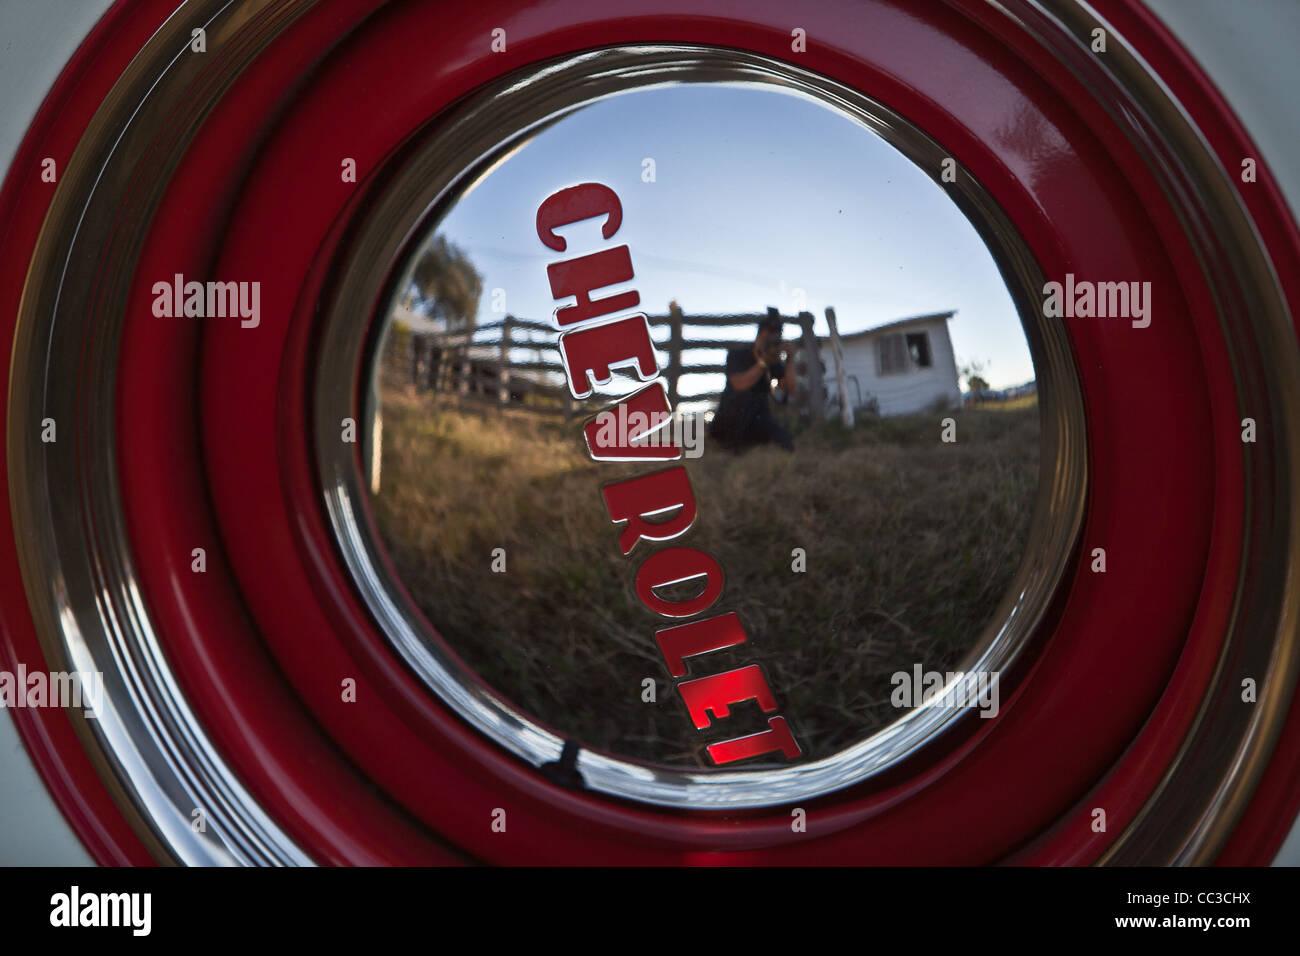 hubcap Stockfotos & ^hubcap Bilder - Seite 2 - Alamy